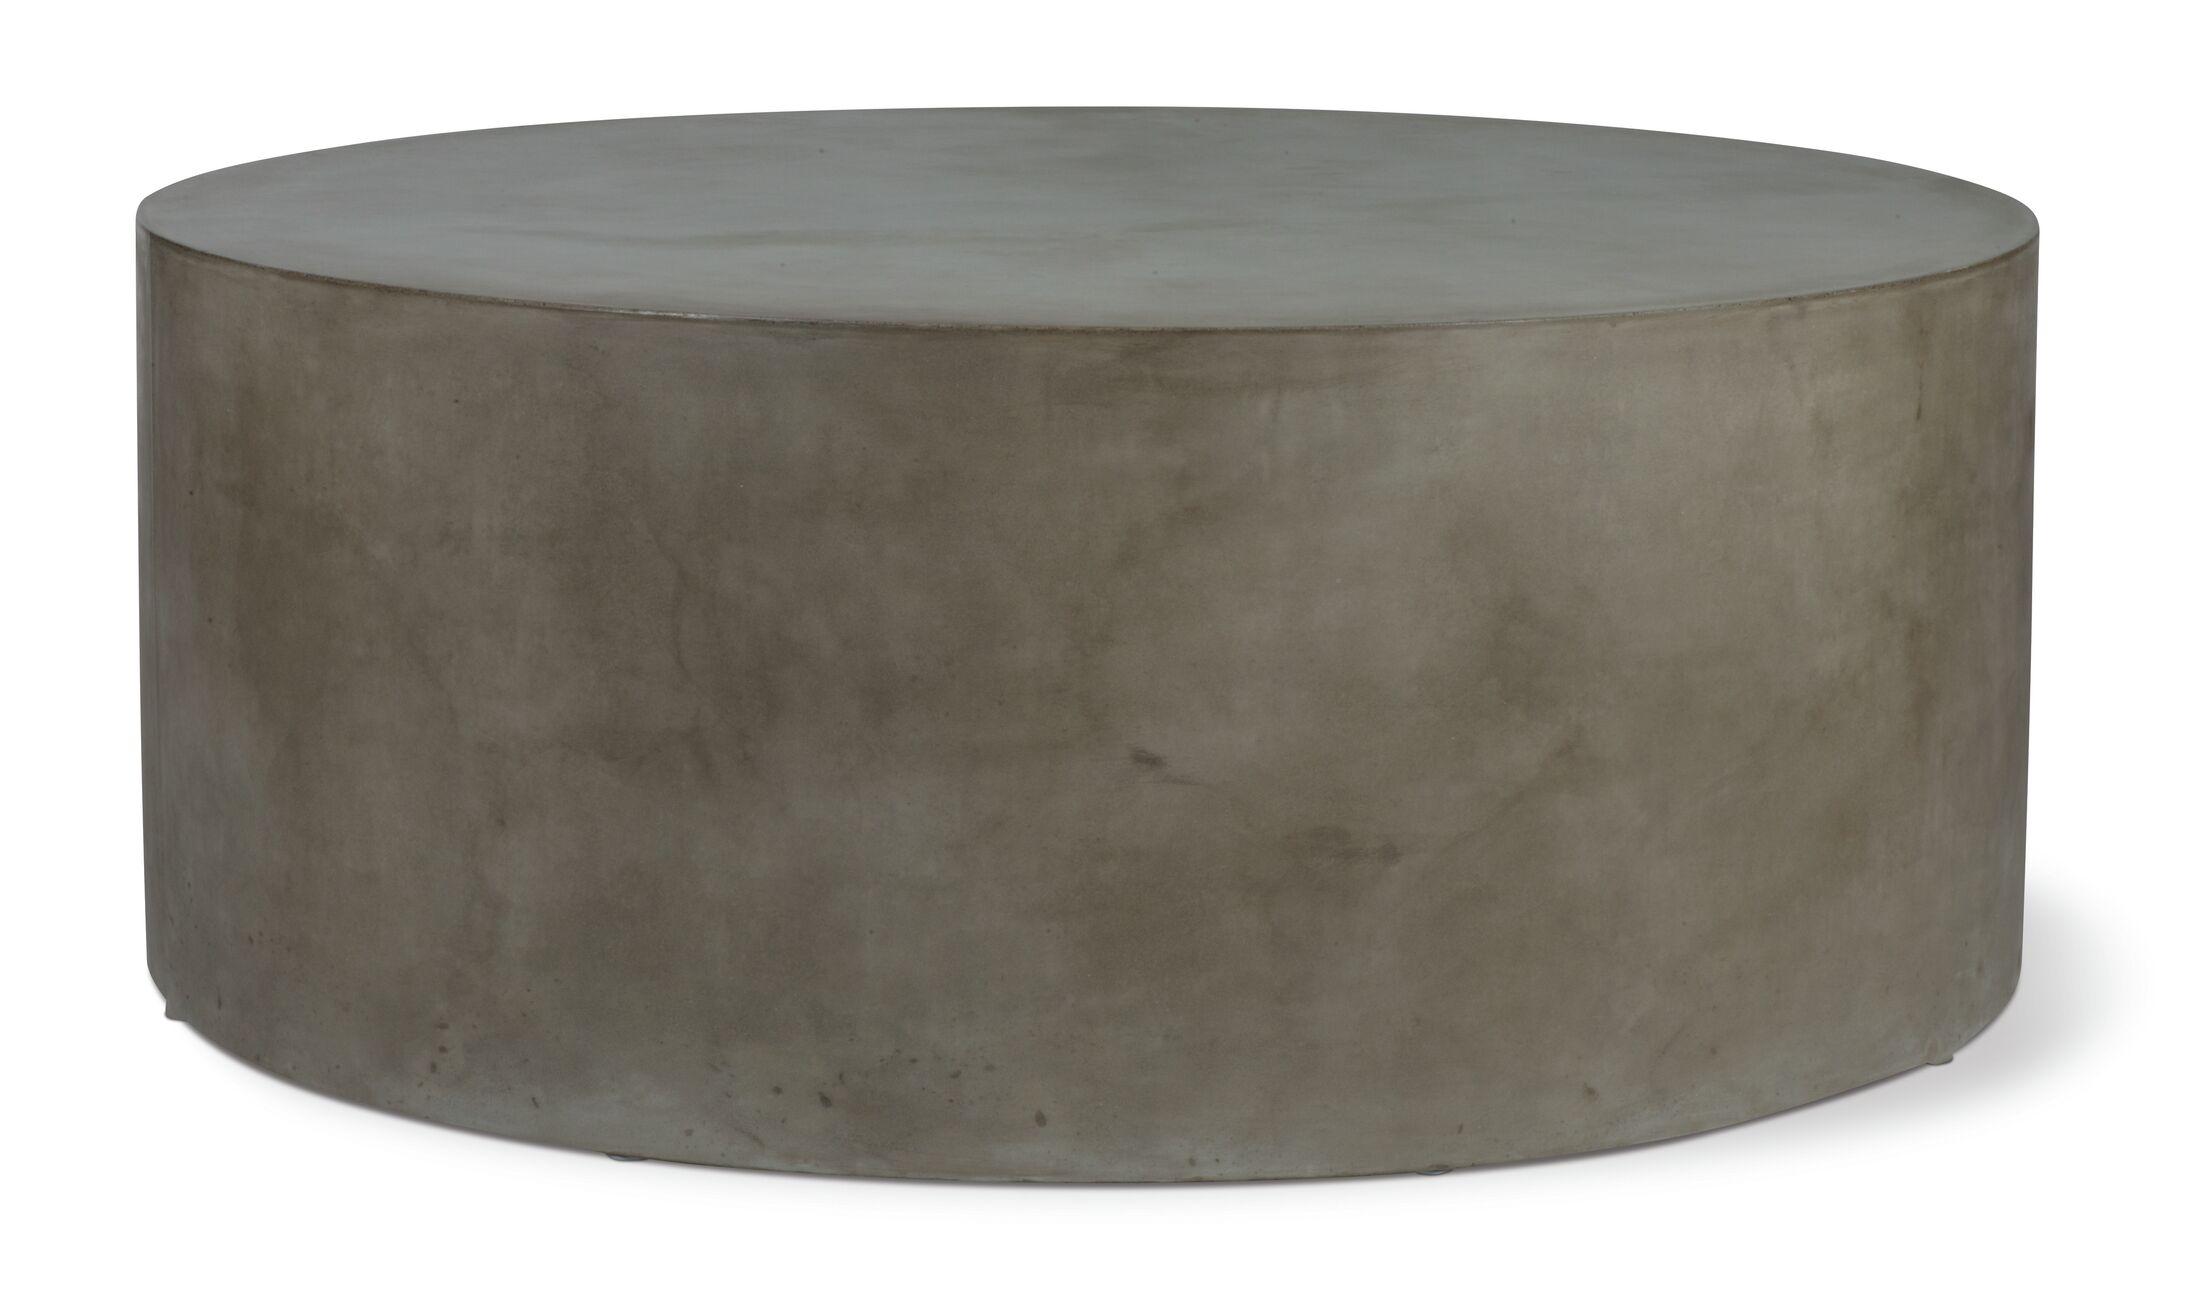 Perpetual Grand Louie Concrete Coffee Table Finish: Slate Gray